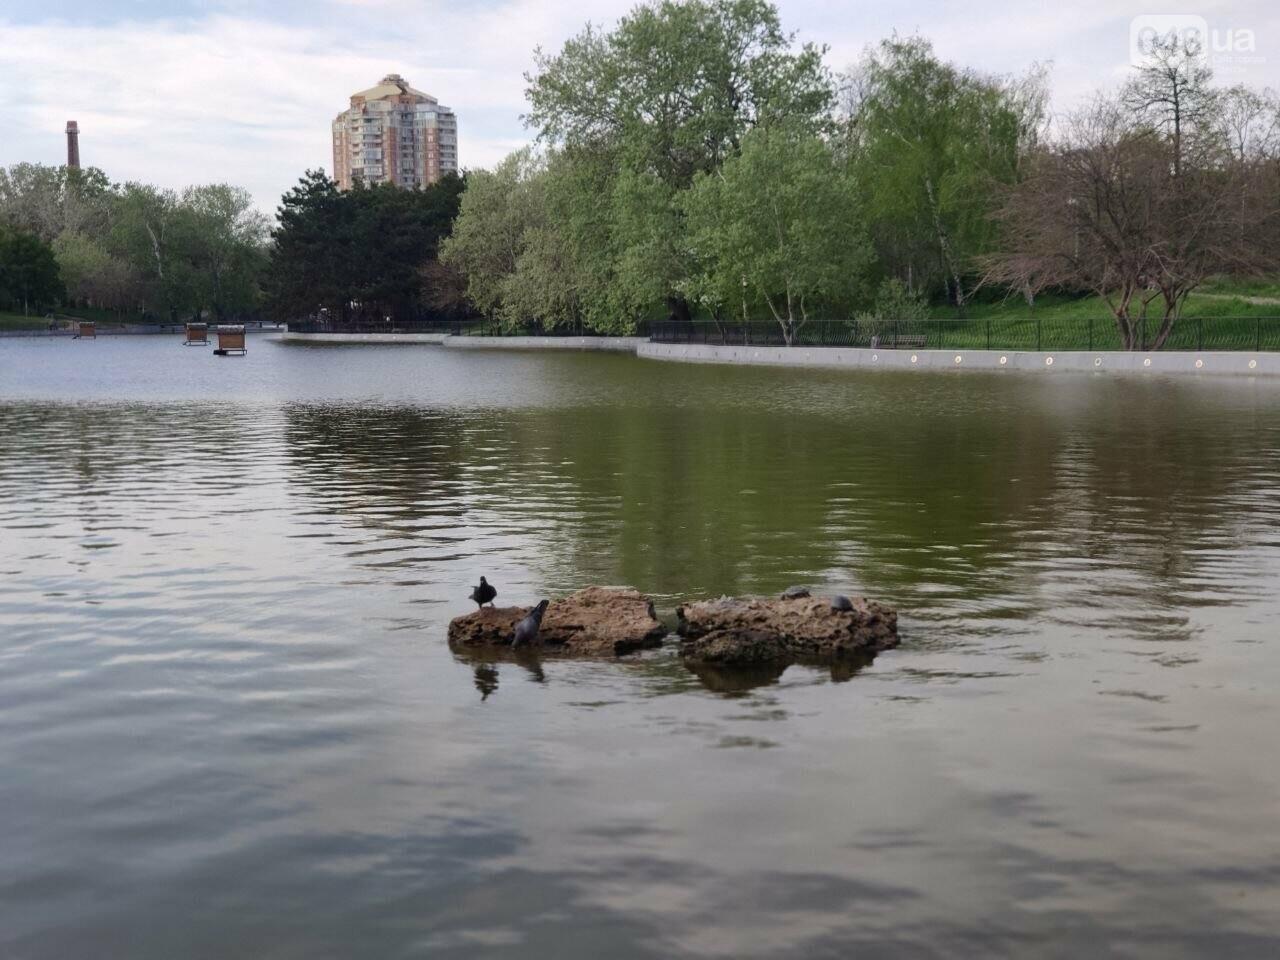 Сакура, лебеди и черепахи: сотни одесситов вышли на прогулку в парк Победы, - ФОТОРЕПОРТАЖ, фото-11